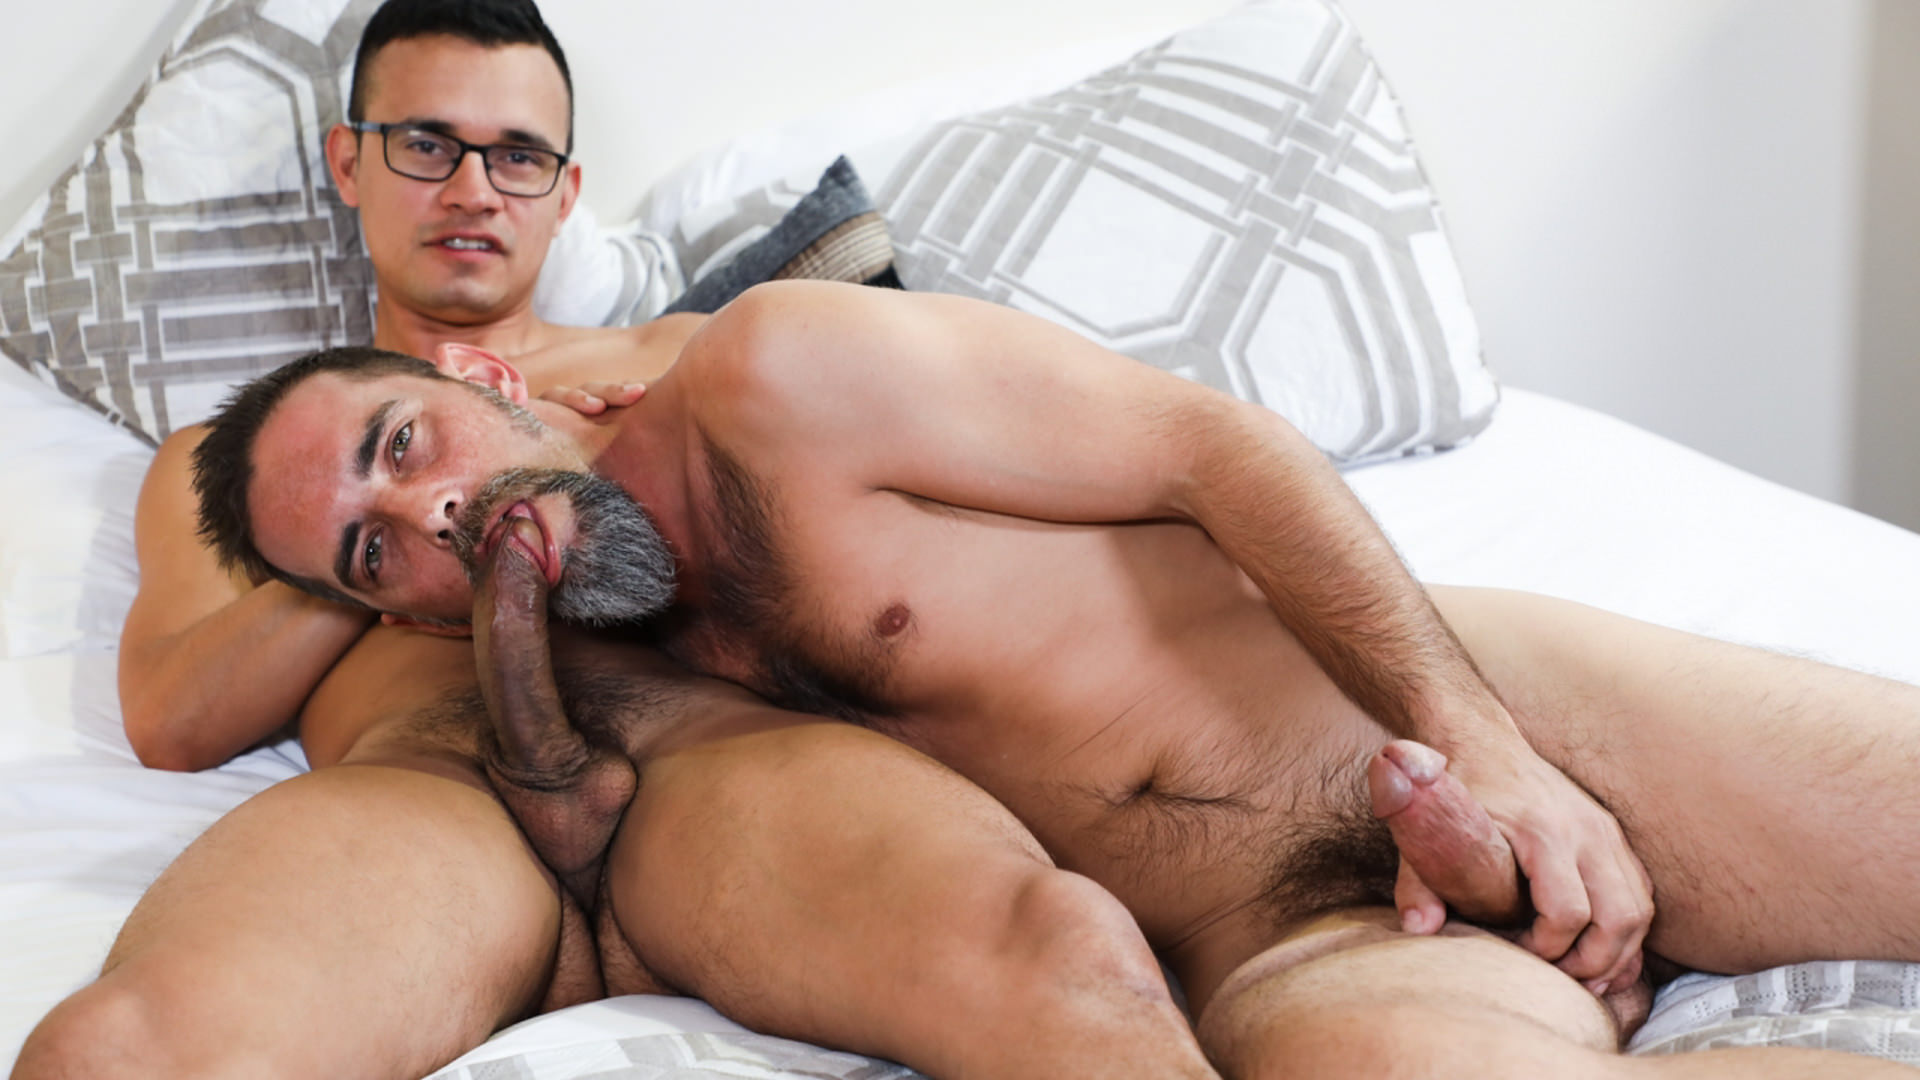 Daddy's Big Dick